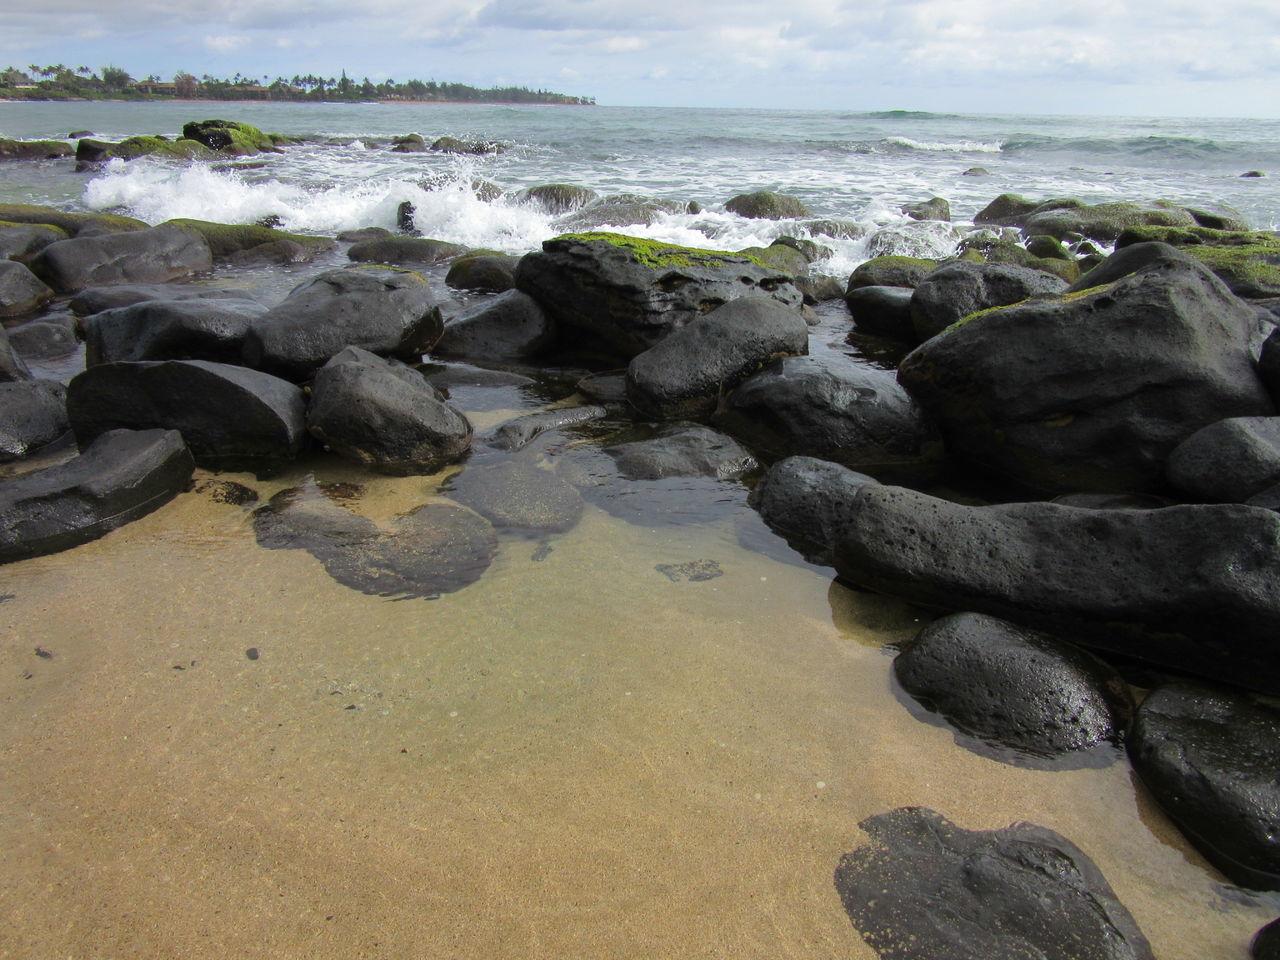 Beach Sea Water Nature Sand Horizon Over Water No People Kauai, Hawaii Kauai Hawaii Rocks And Water Tranquil Scene